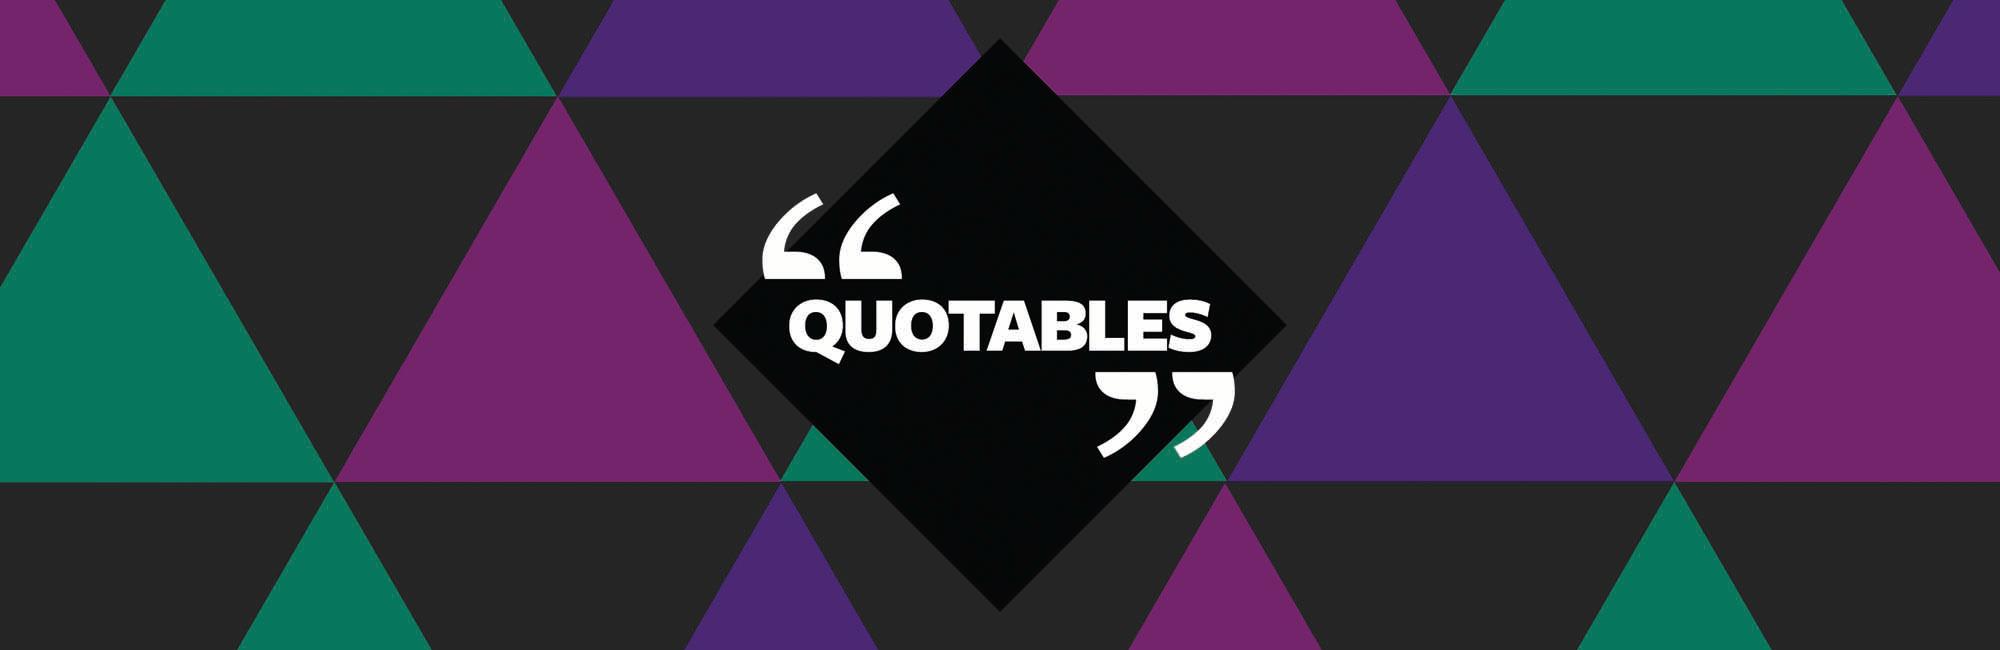 Quotables+-+Sermon+Web+Header3